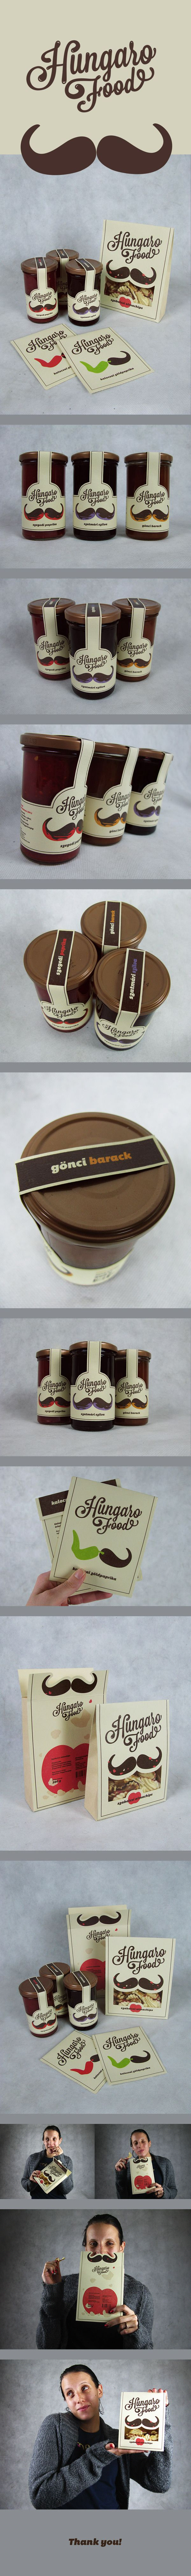 HungaroFood Brand by Adrienn Nagy, via Behance